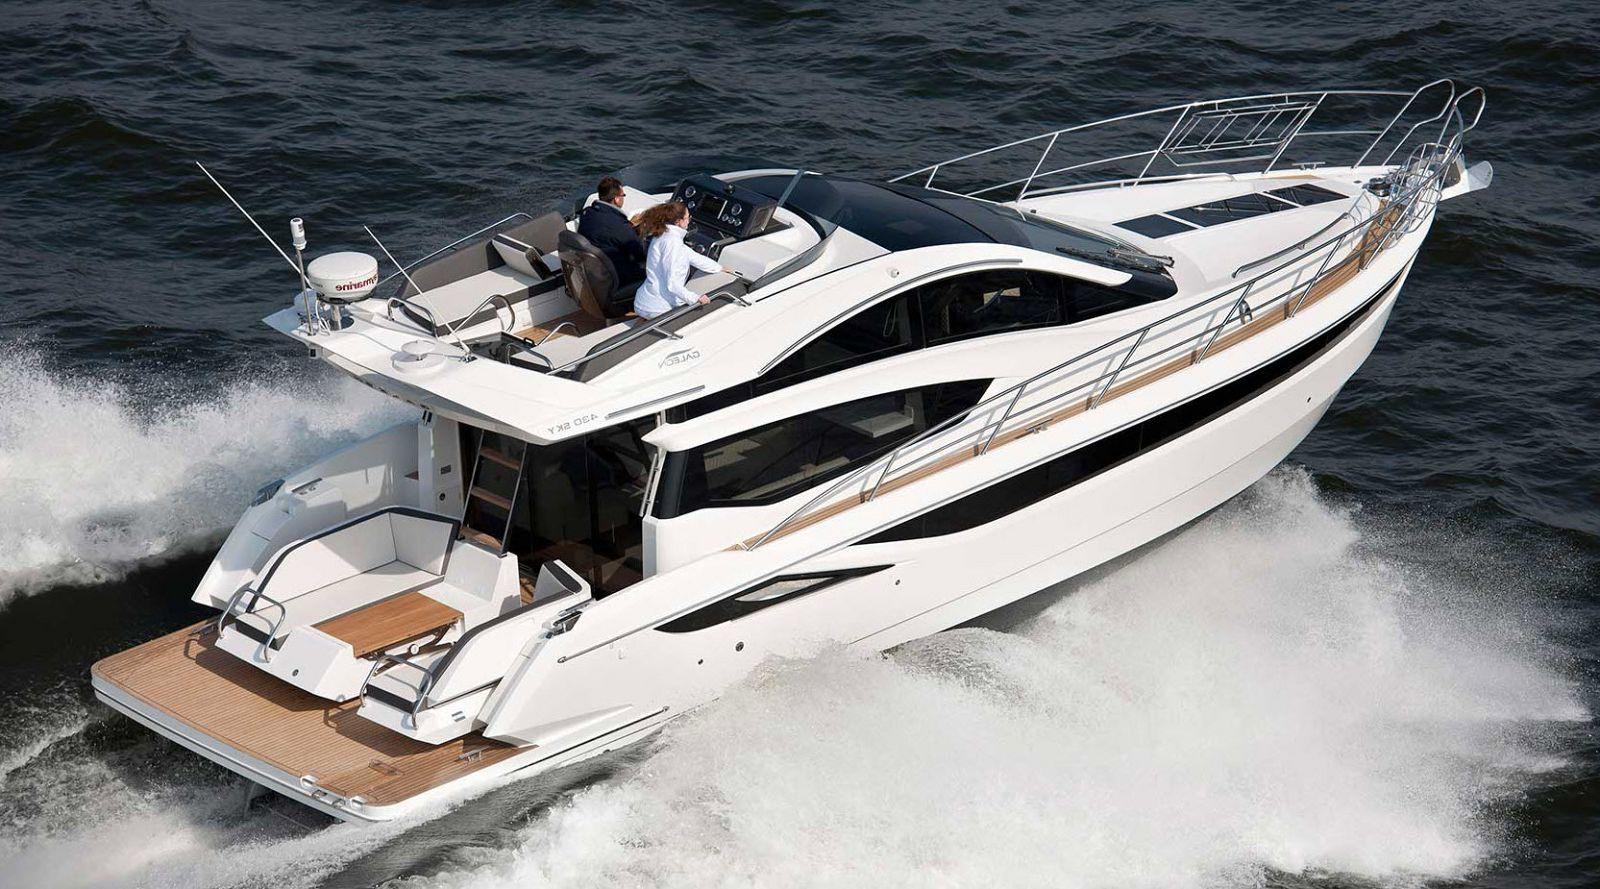 Galeon 430 skydeck yacht